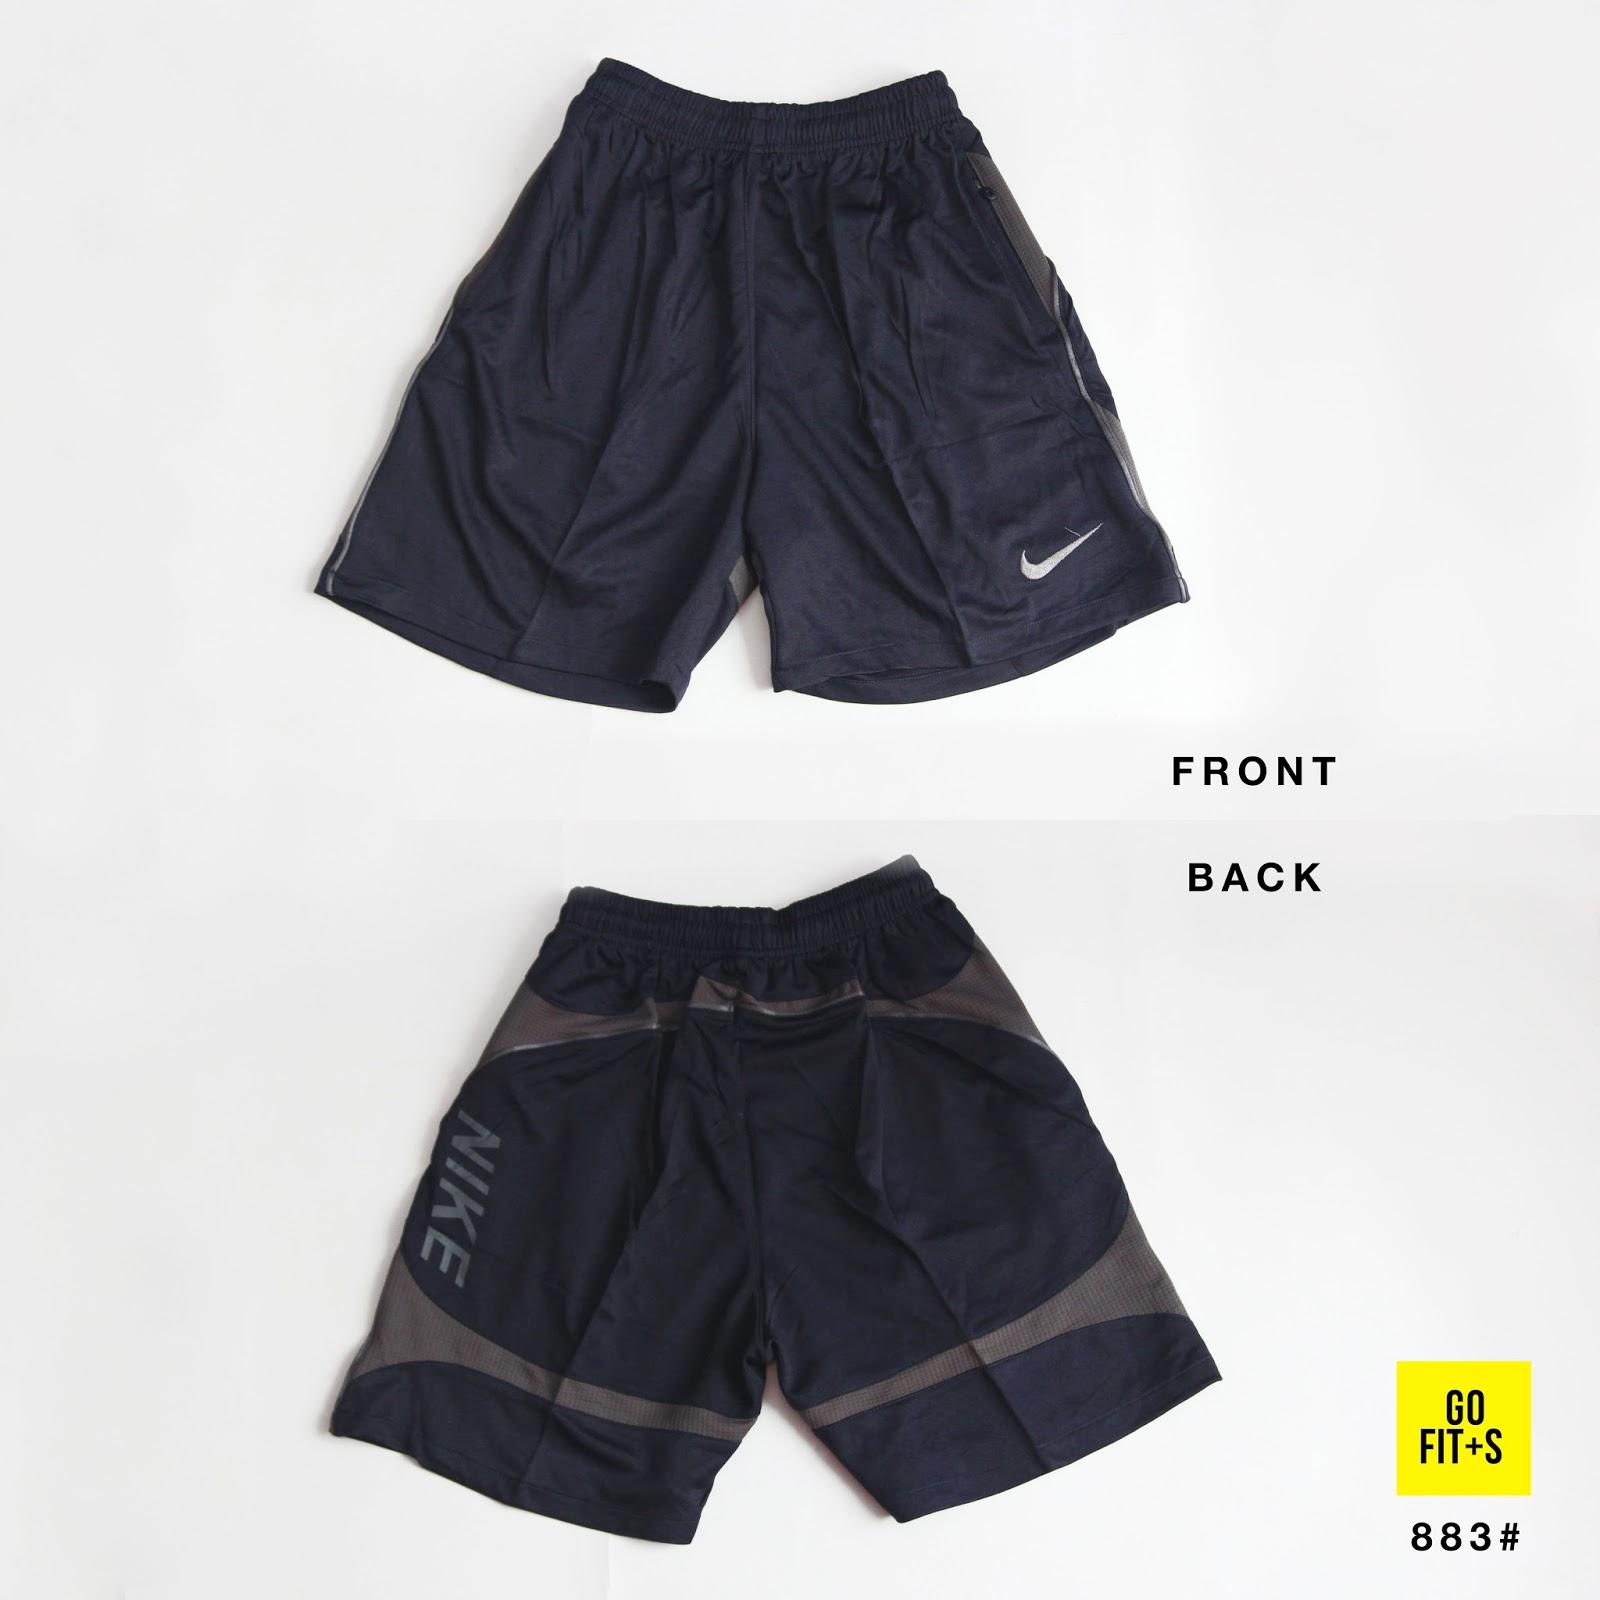 Gofits Celana Pendek Lotto New Training Nike 01 Order Satuan Klik Link Di Bawah Ini Bukalapak